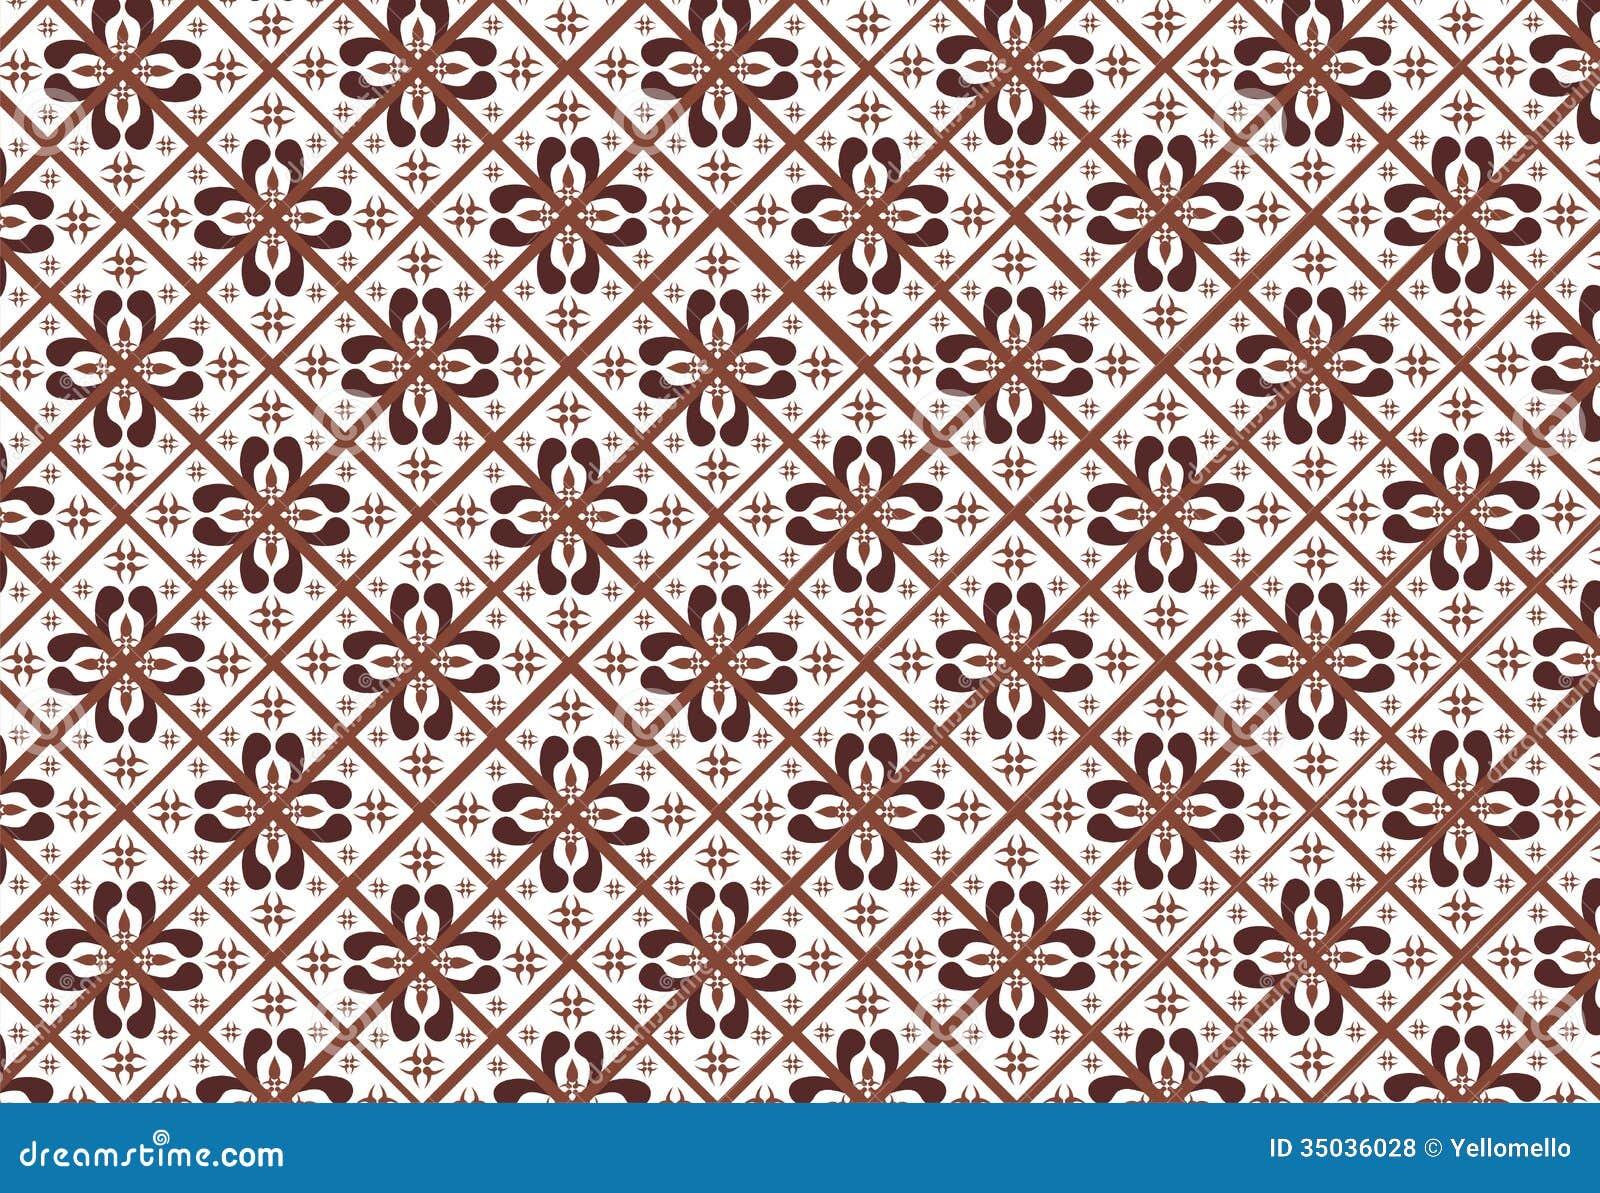 Indonesian Batik Pattern Royalty Free Stock Photos - Image: 35036028